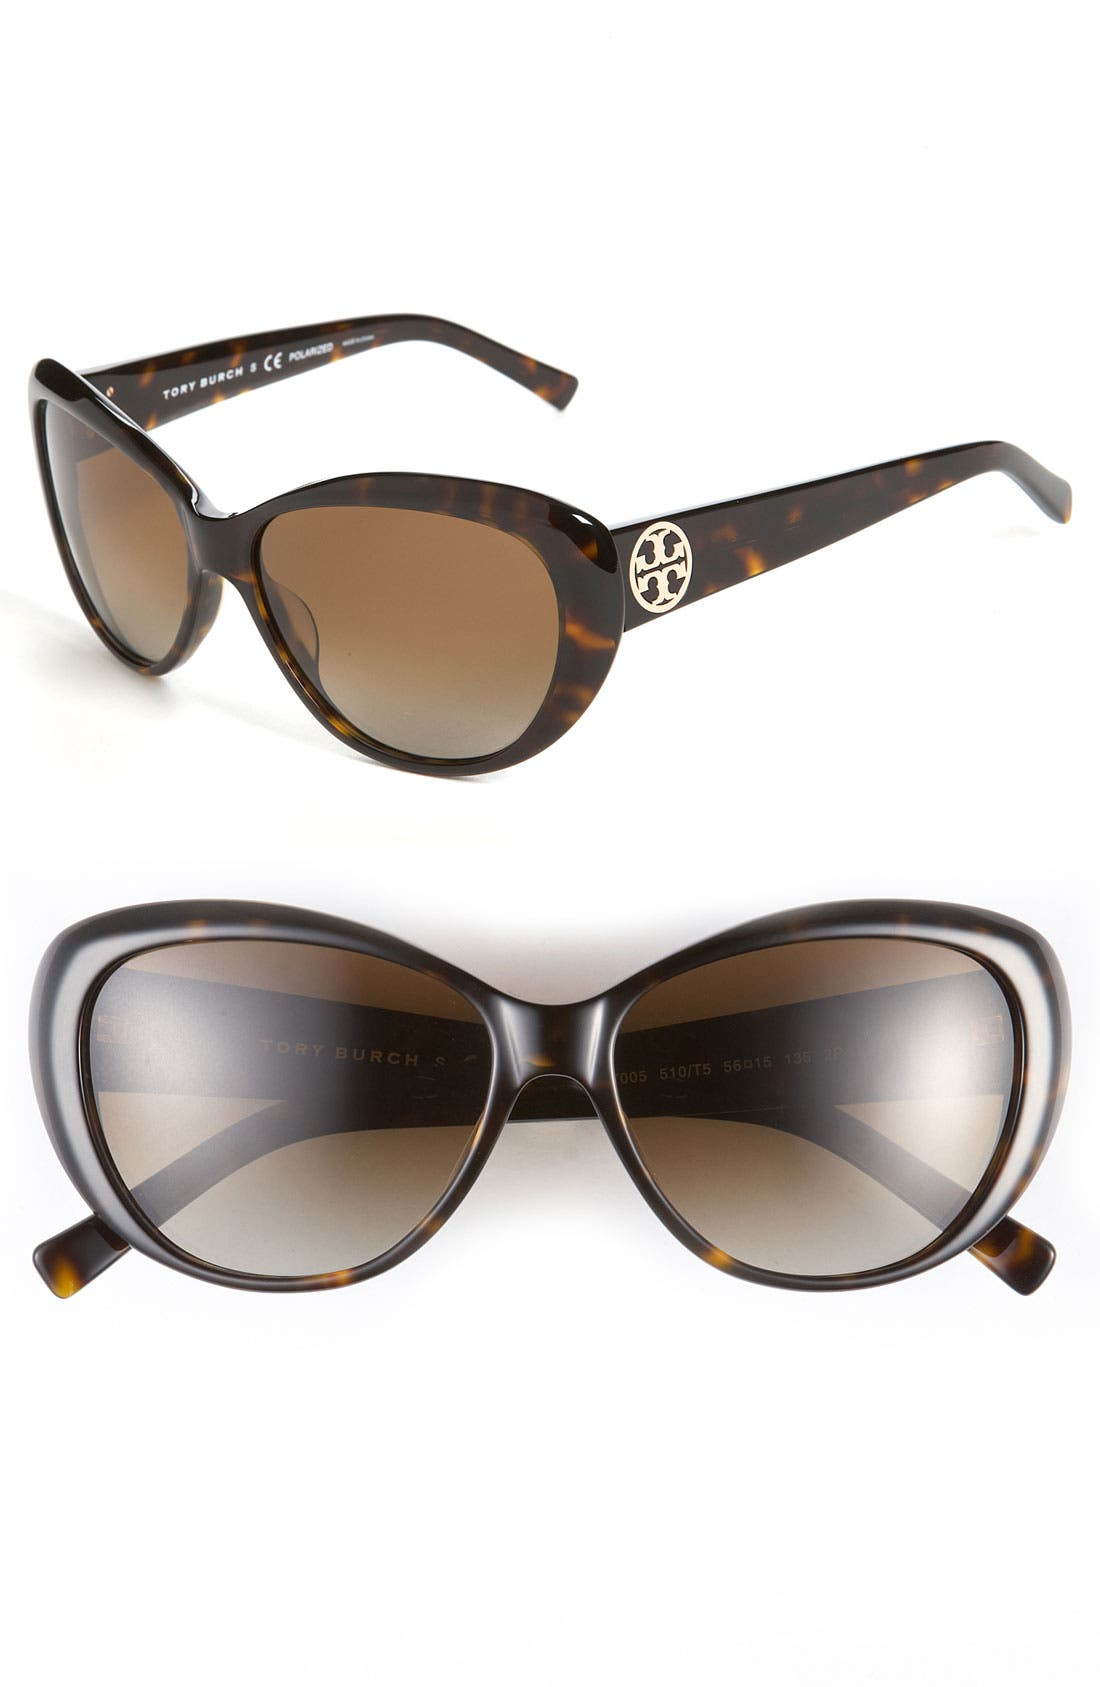 Main Image - Tory Burch 56mm Polarized Cat's Eye Sunglasses